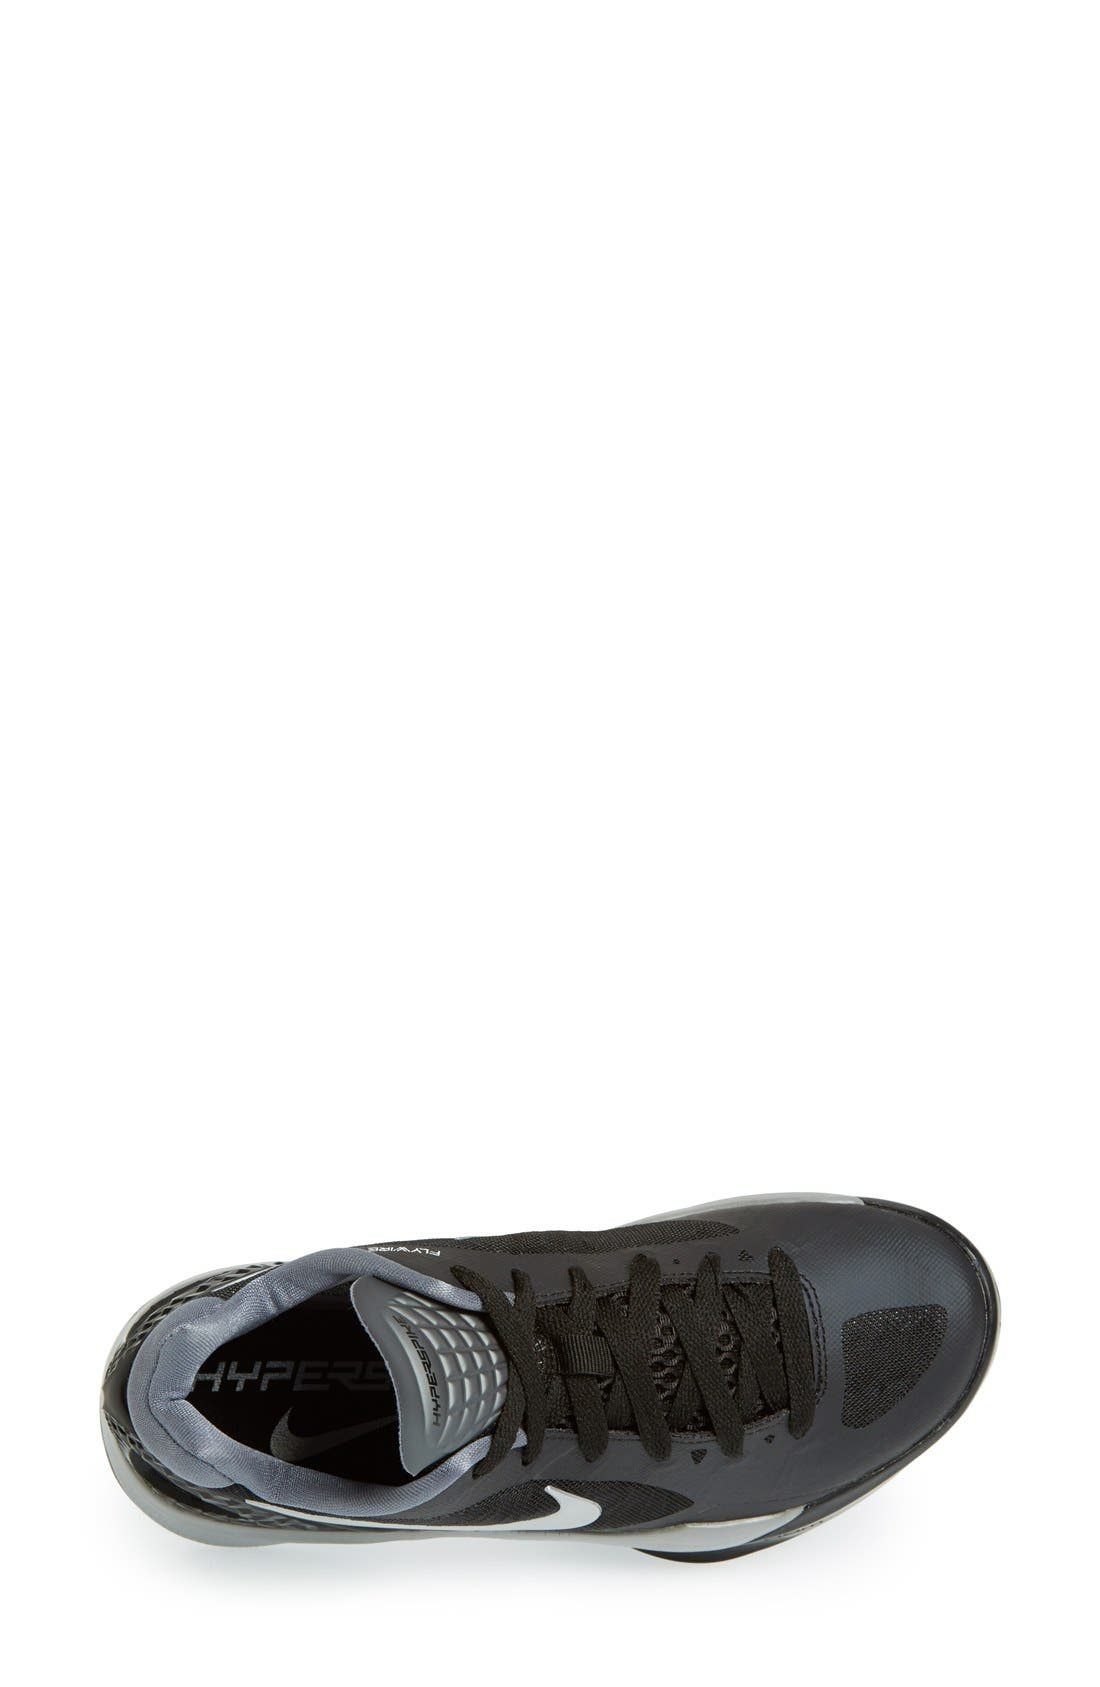 Alternate Image 3  - Nike 'Zoom Hyperspike' Volleyball Shoe (Women)